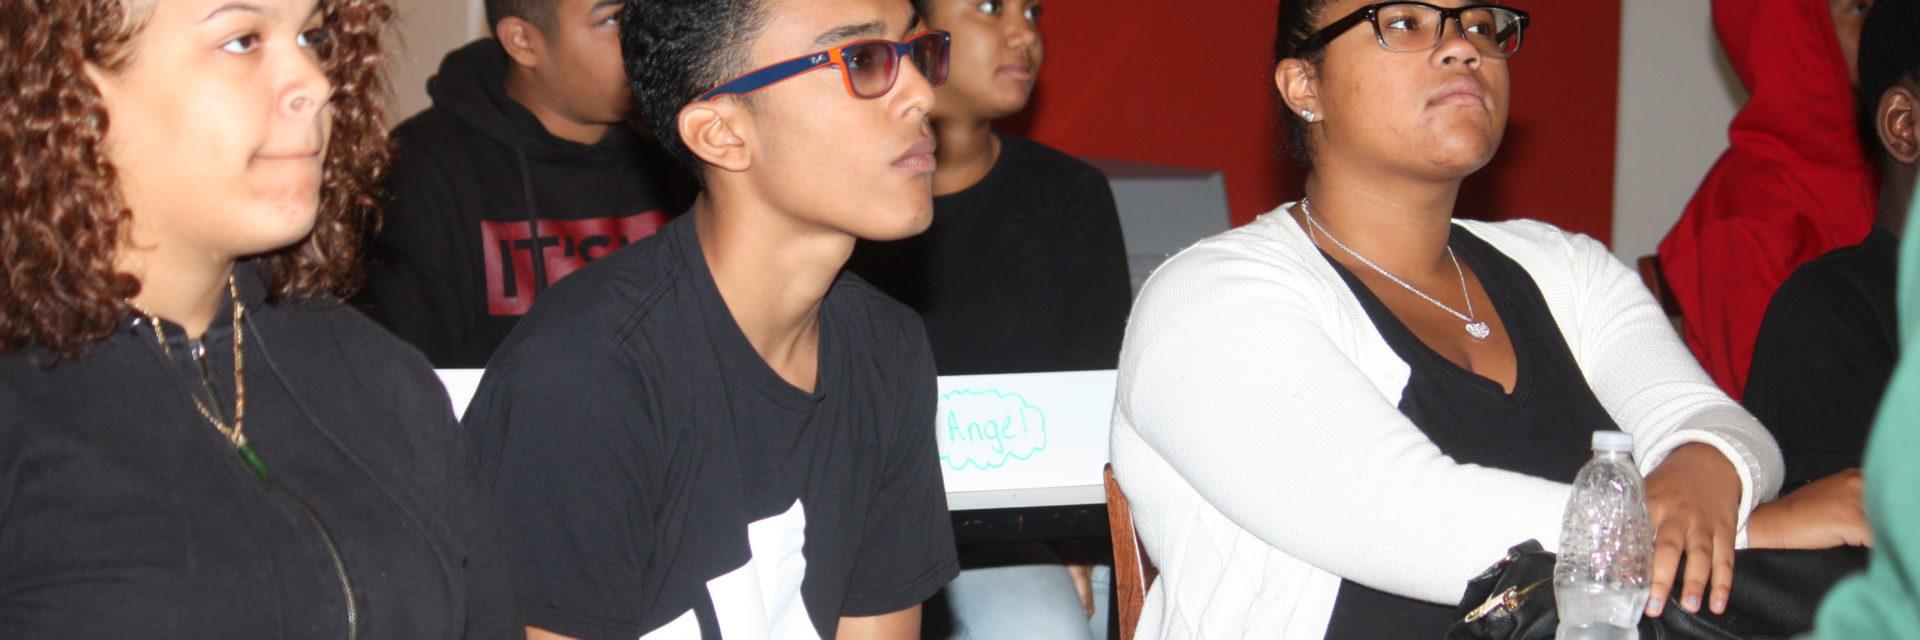 Teen Squad program, My City, My Place participants